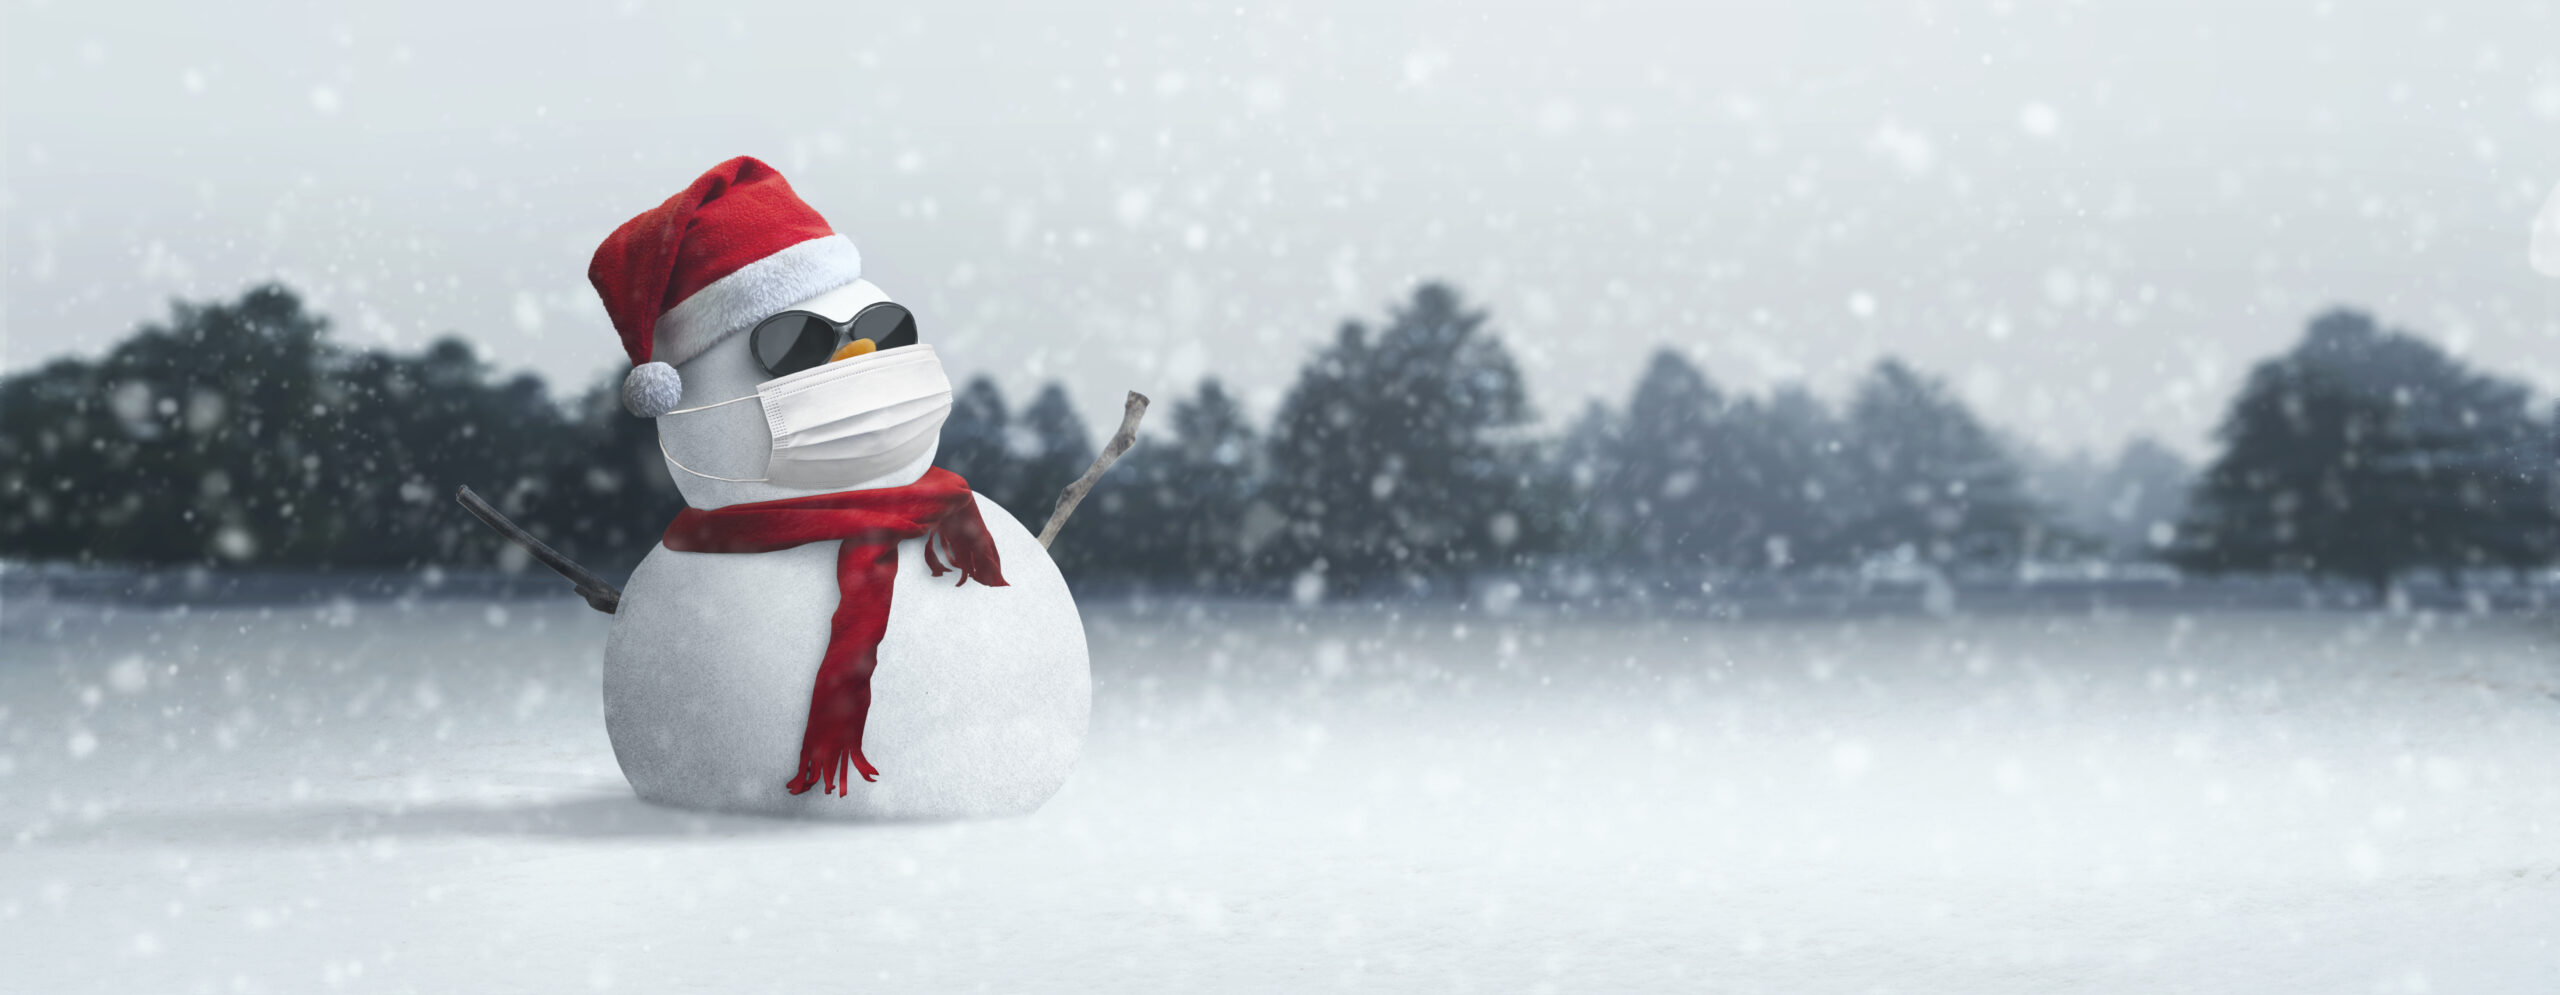 Metametrics Blog - It's Starting To Look Not Like Christmas